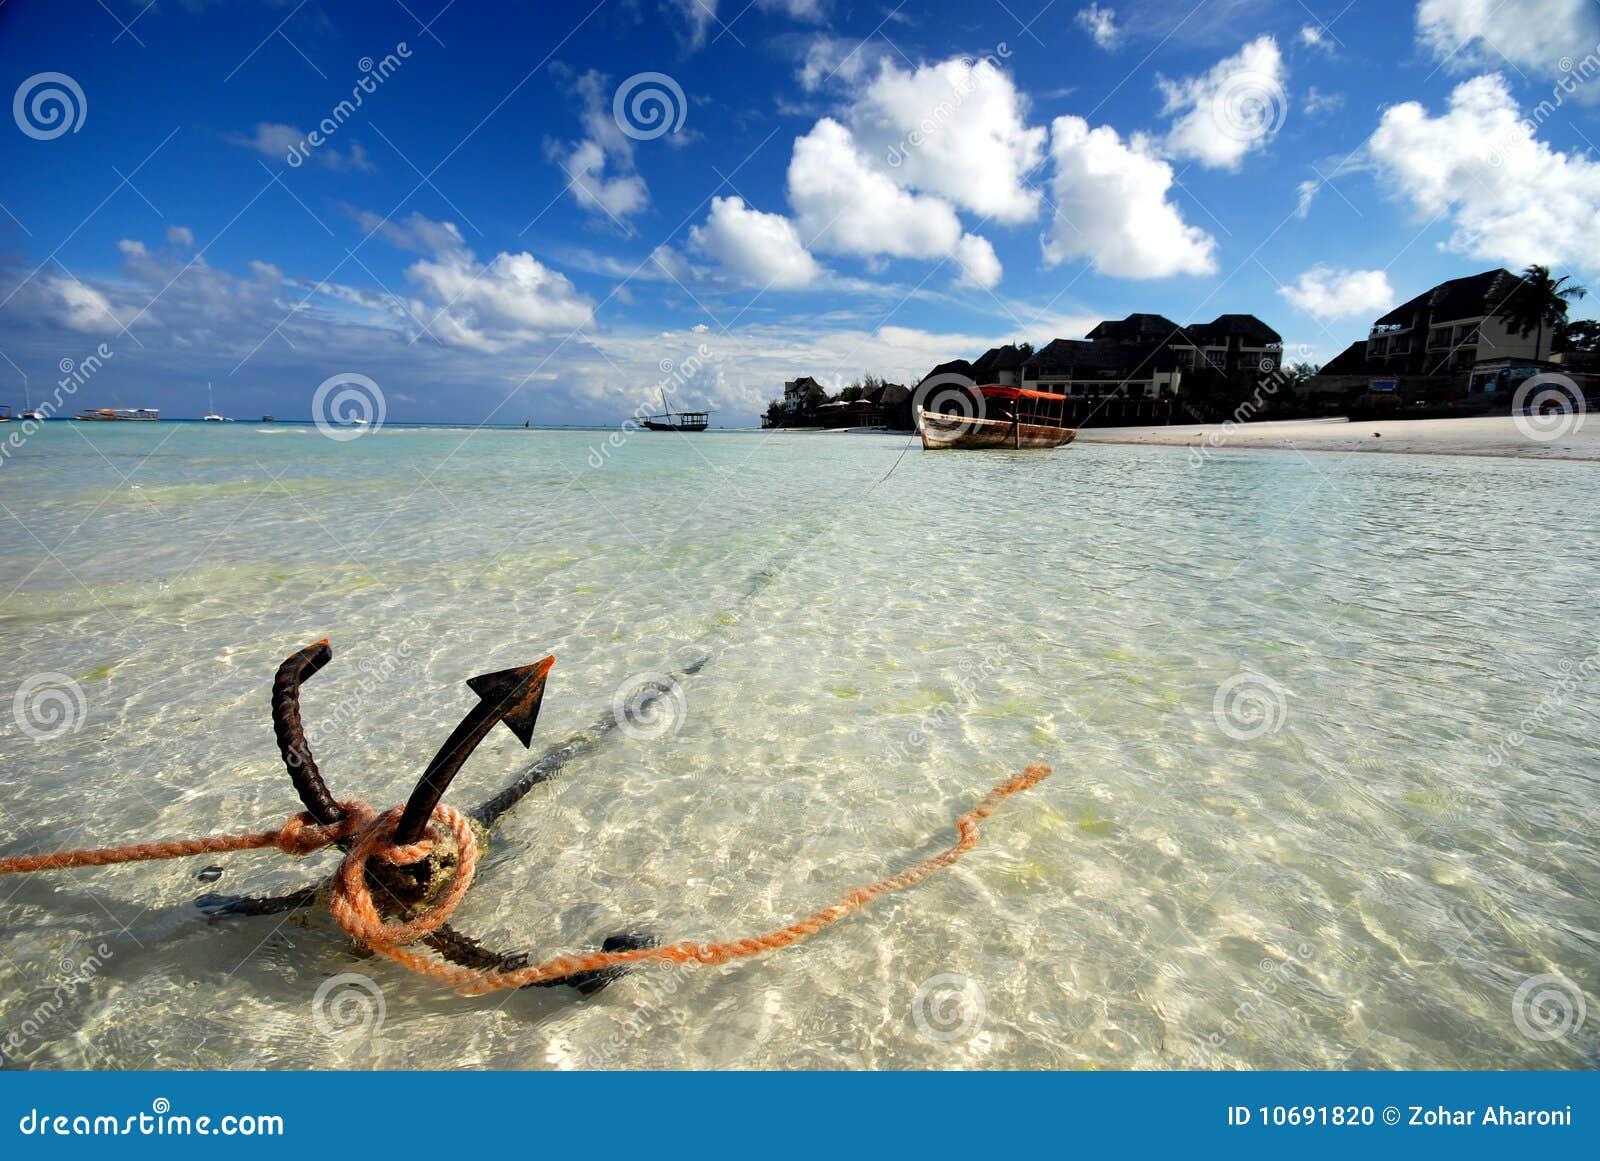 Download Anchor stock photo. Image of zanzibar, unguja, boat, africa - 10691820